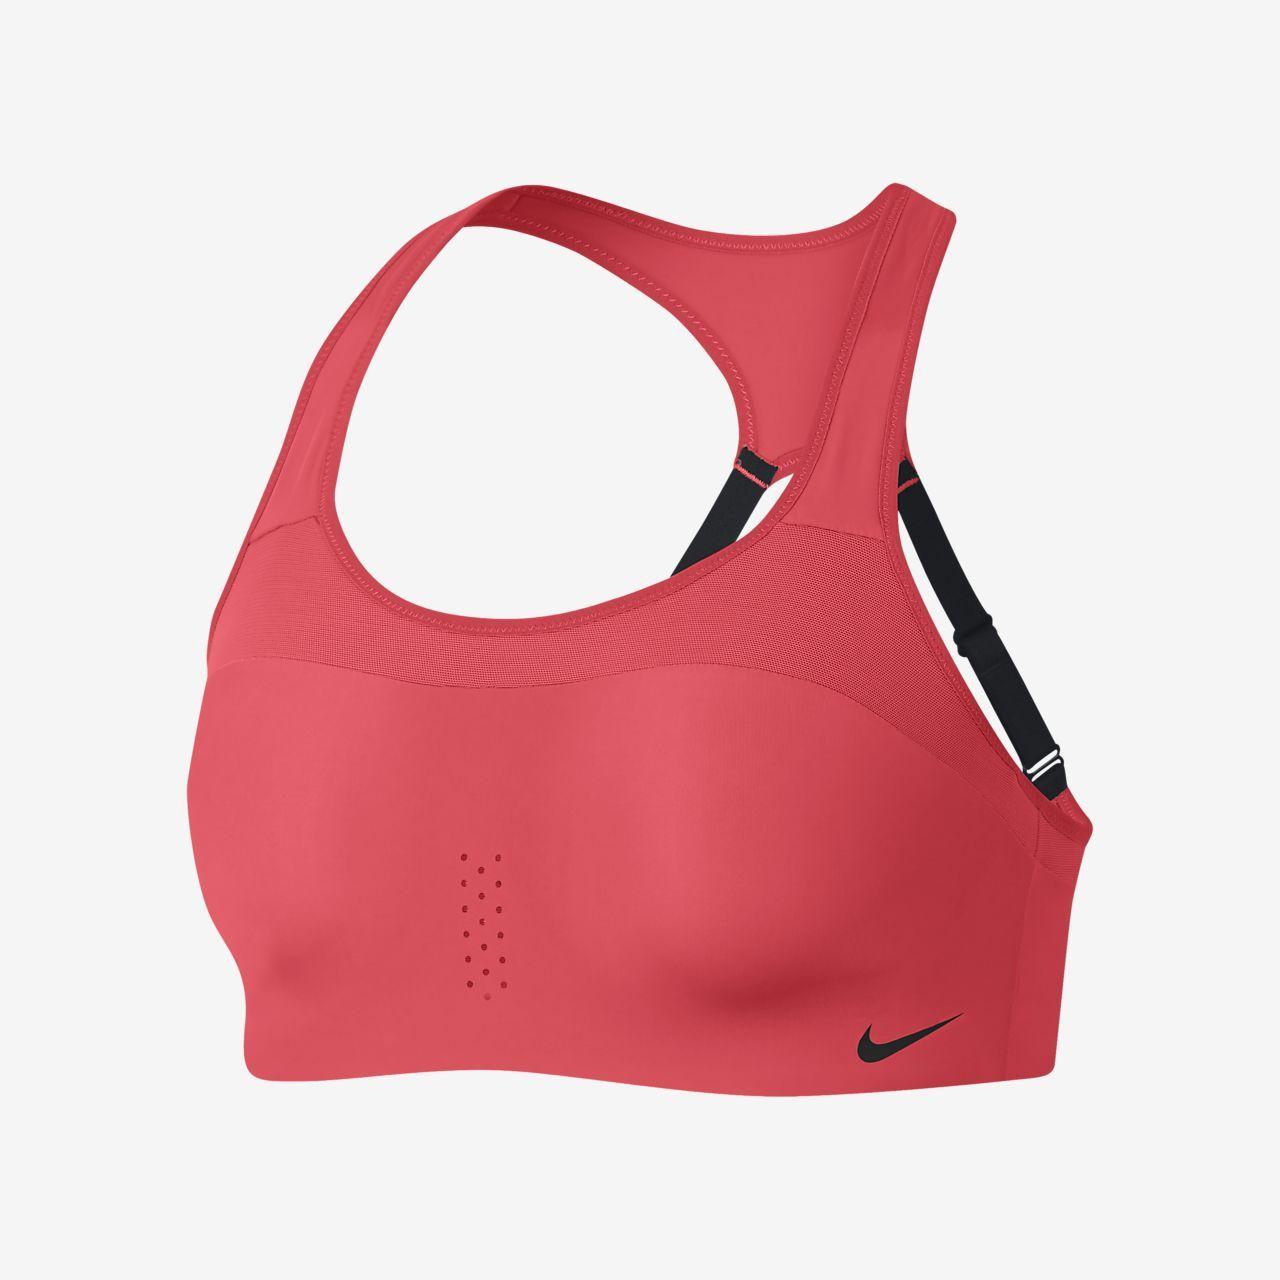 Nike Alpha Women S High Support Sports Bra High Support Sports Bra Sports Bra Red Sports Bra